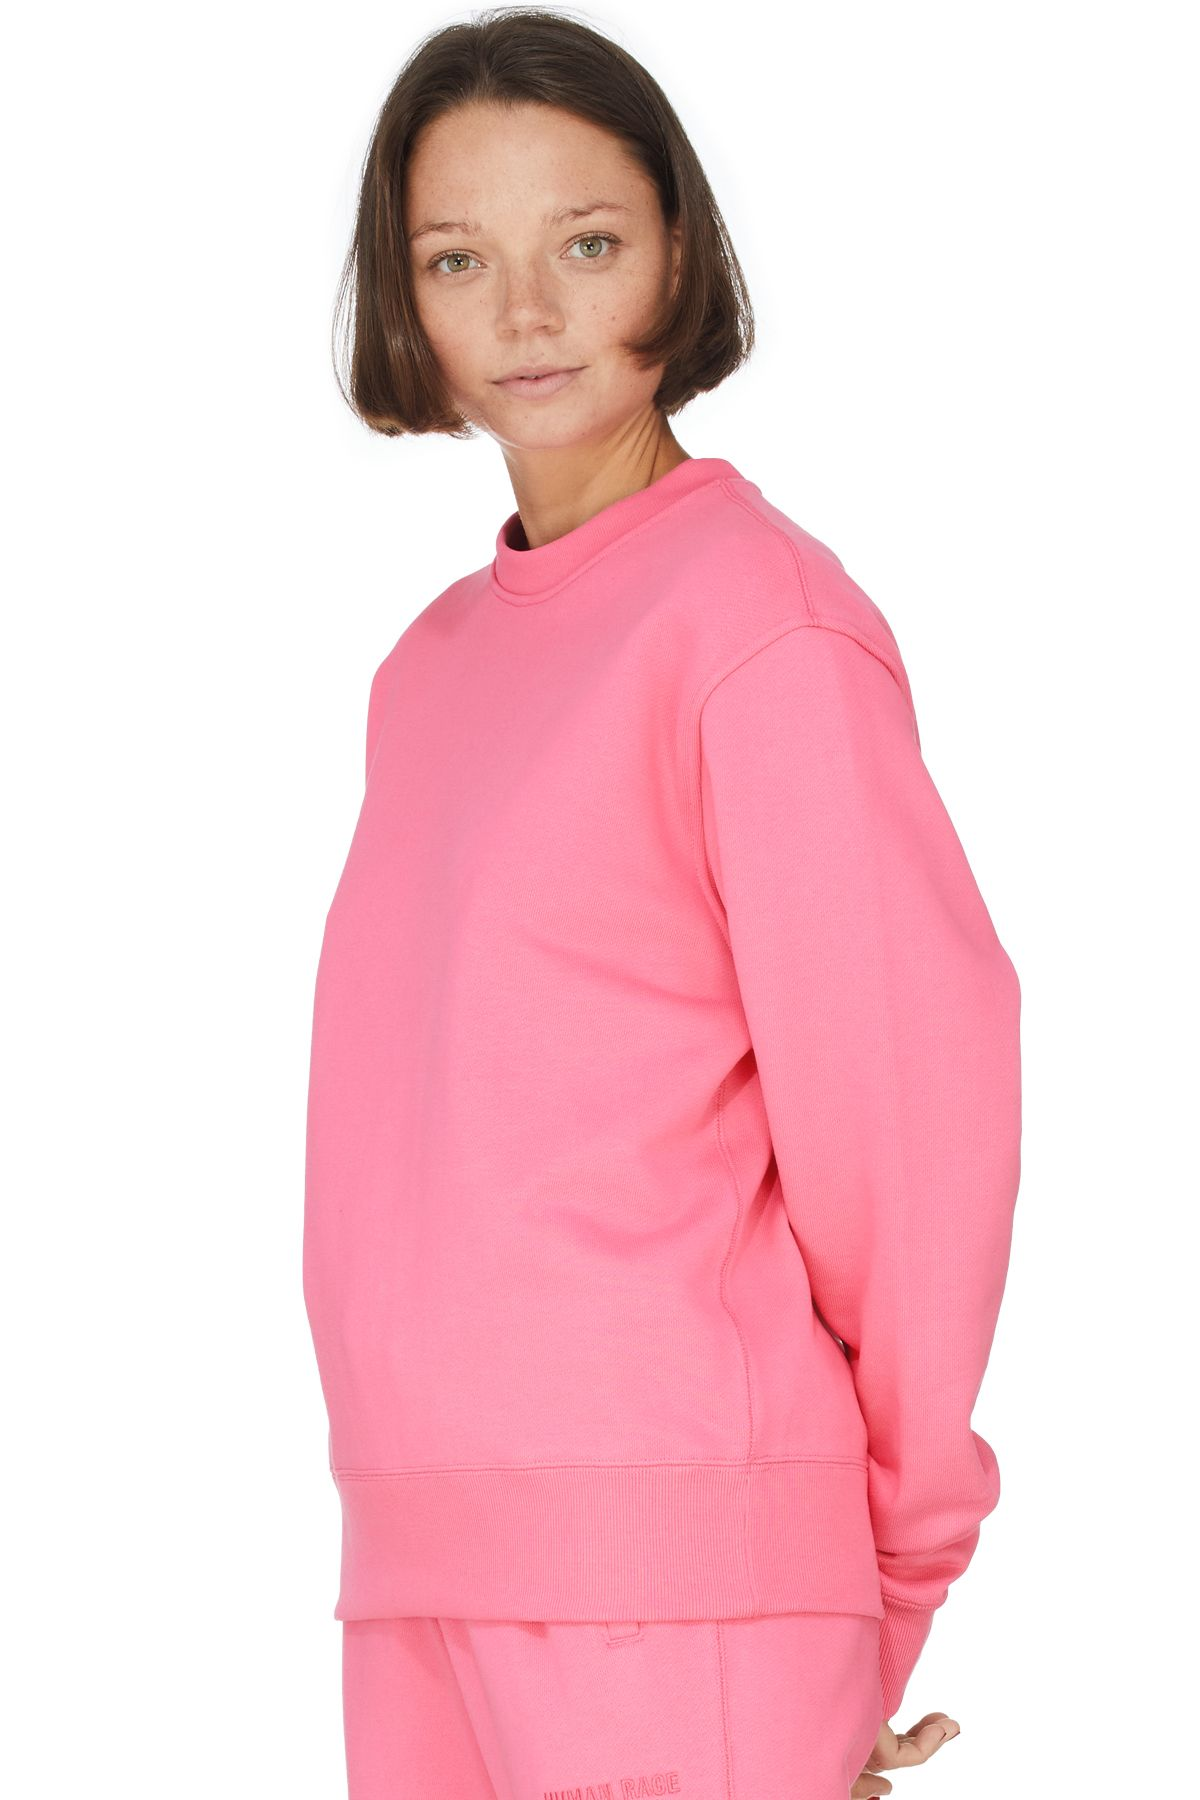 Adidas Originals X Pharrell Williams Pharrell Williams Basics Crew Sweater Semi Solar Pink Pharrell Williams Crew Sweaters Pharrell [ 1800 x 1200 Pixel ]